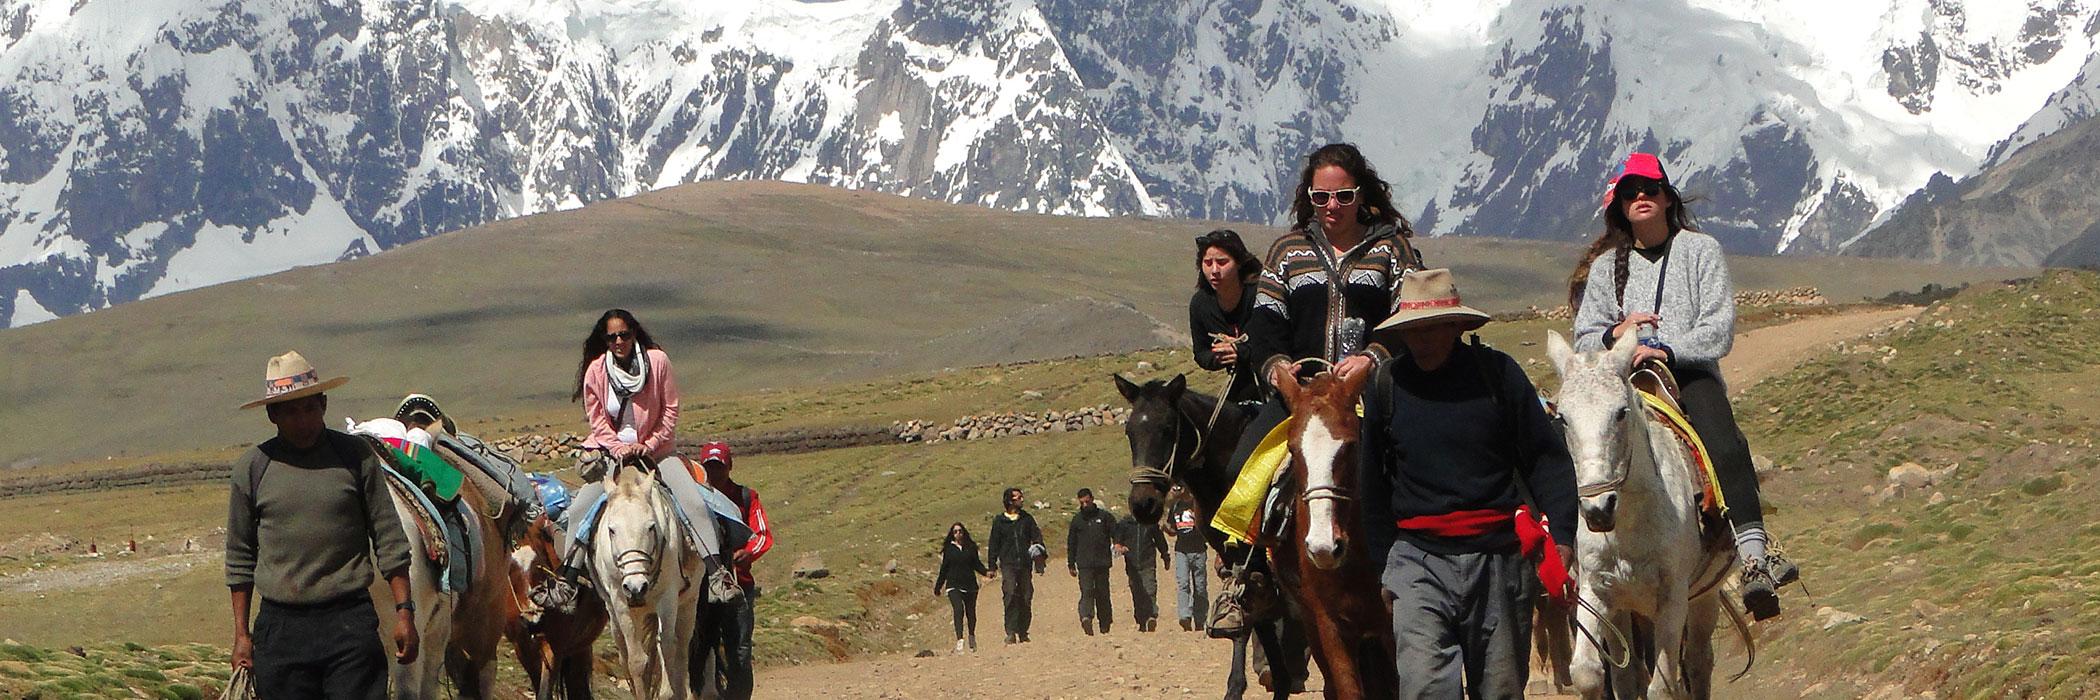 ausangate trek 13 days (1)